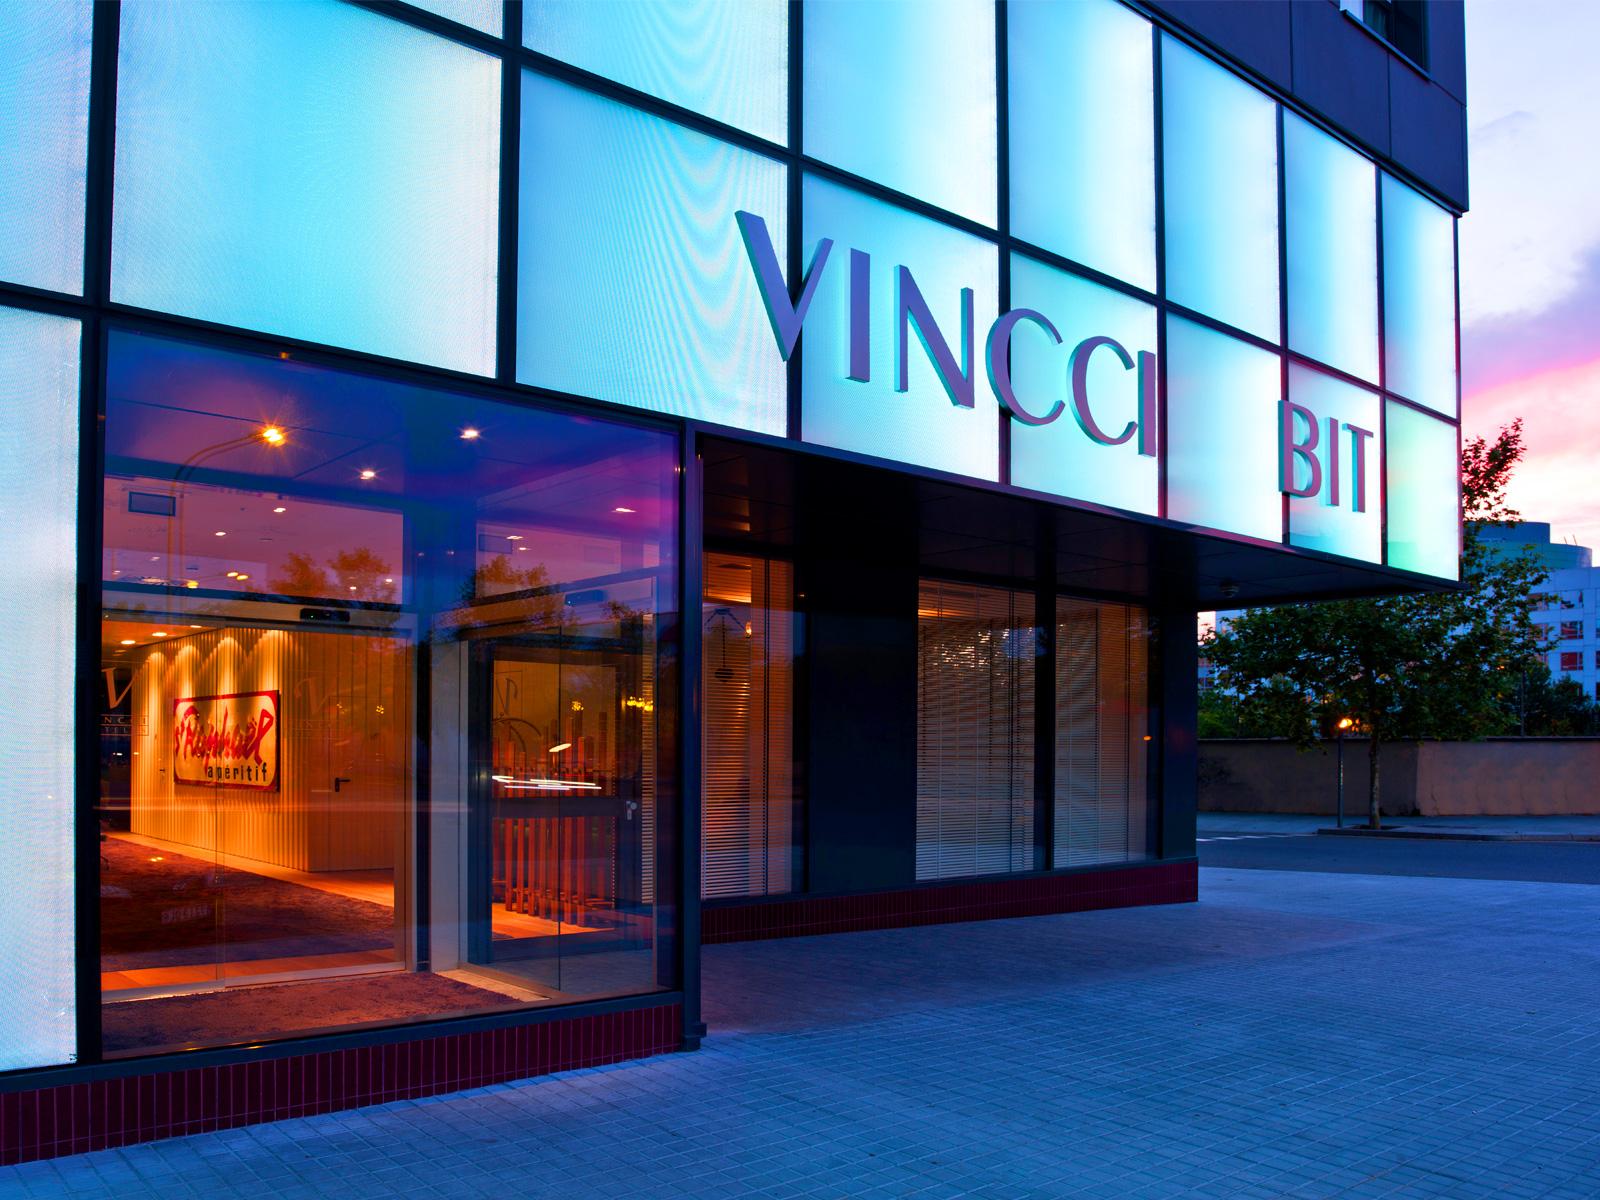 Hotel vincci bit in barcelona spanien mit 4 sternen - Hoteles vincci barcelona ...